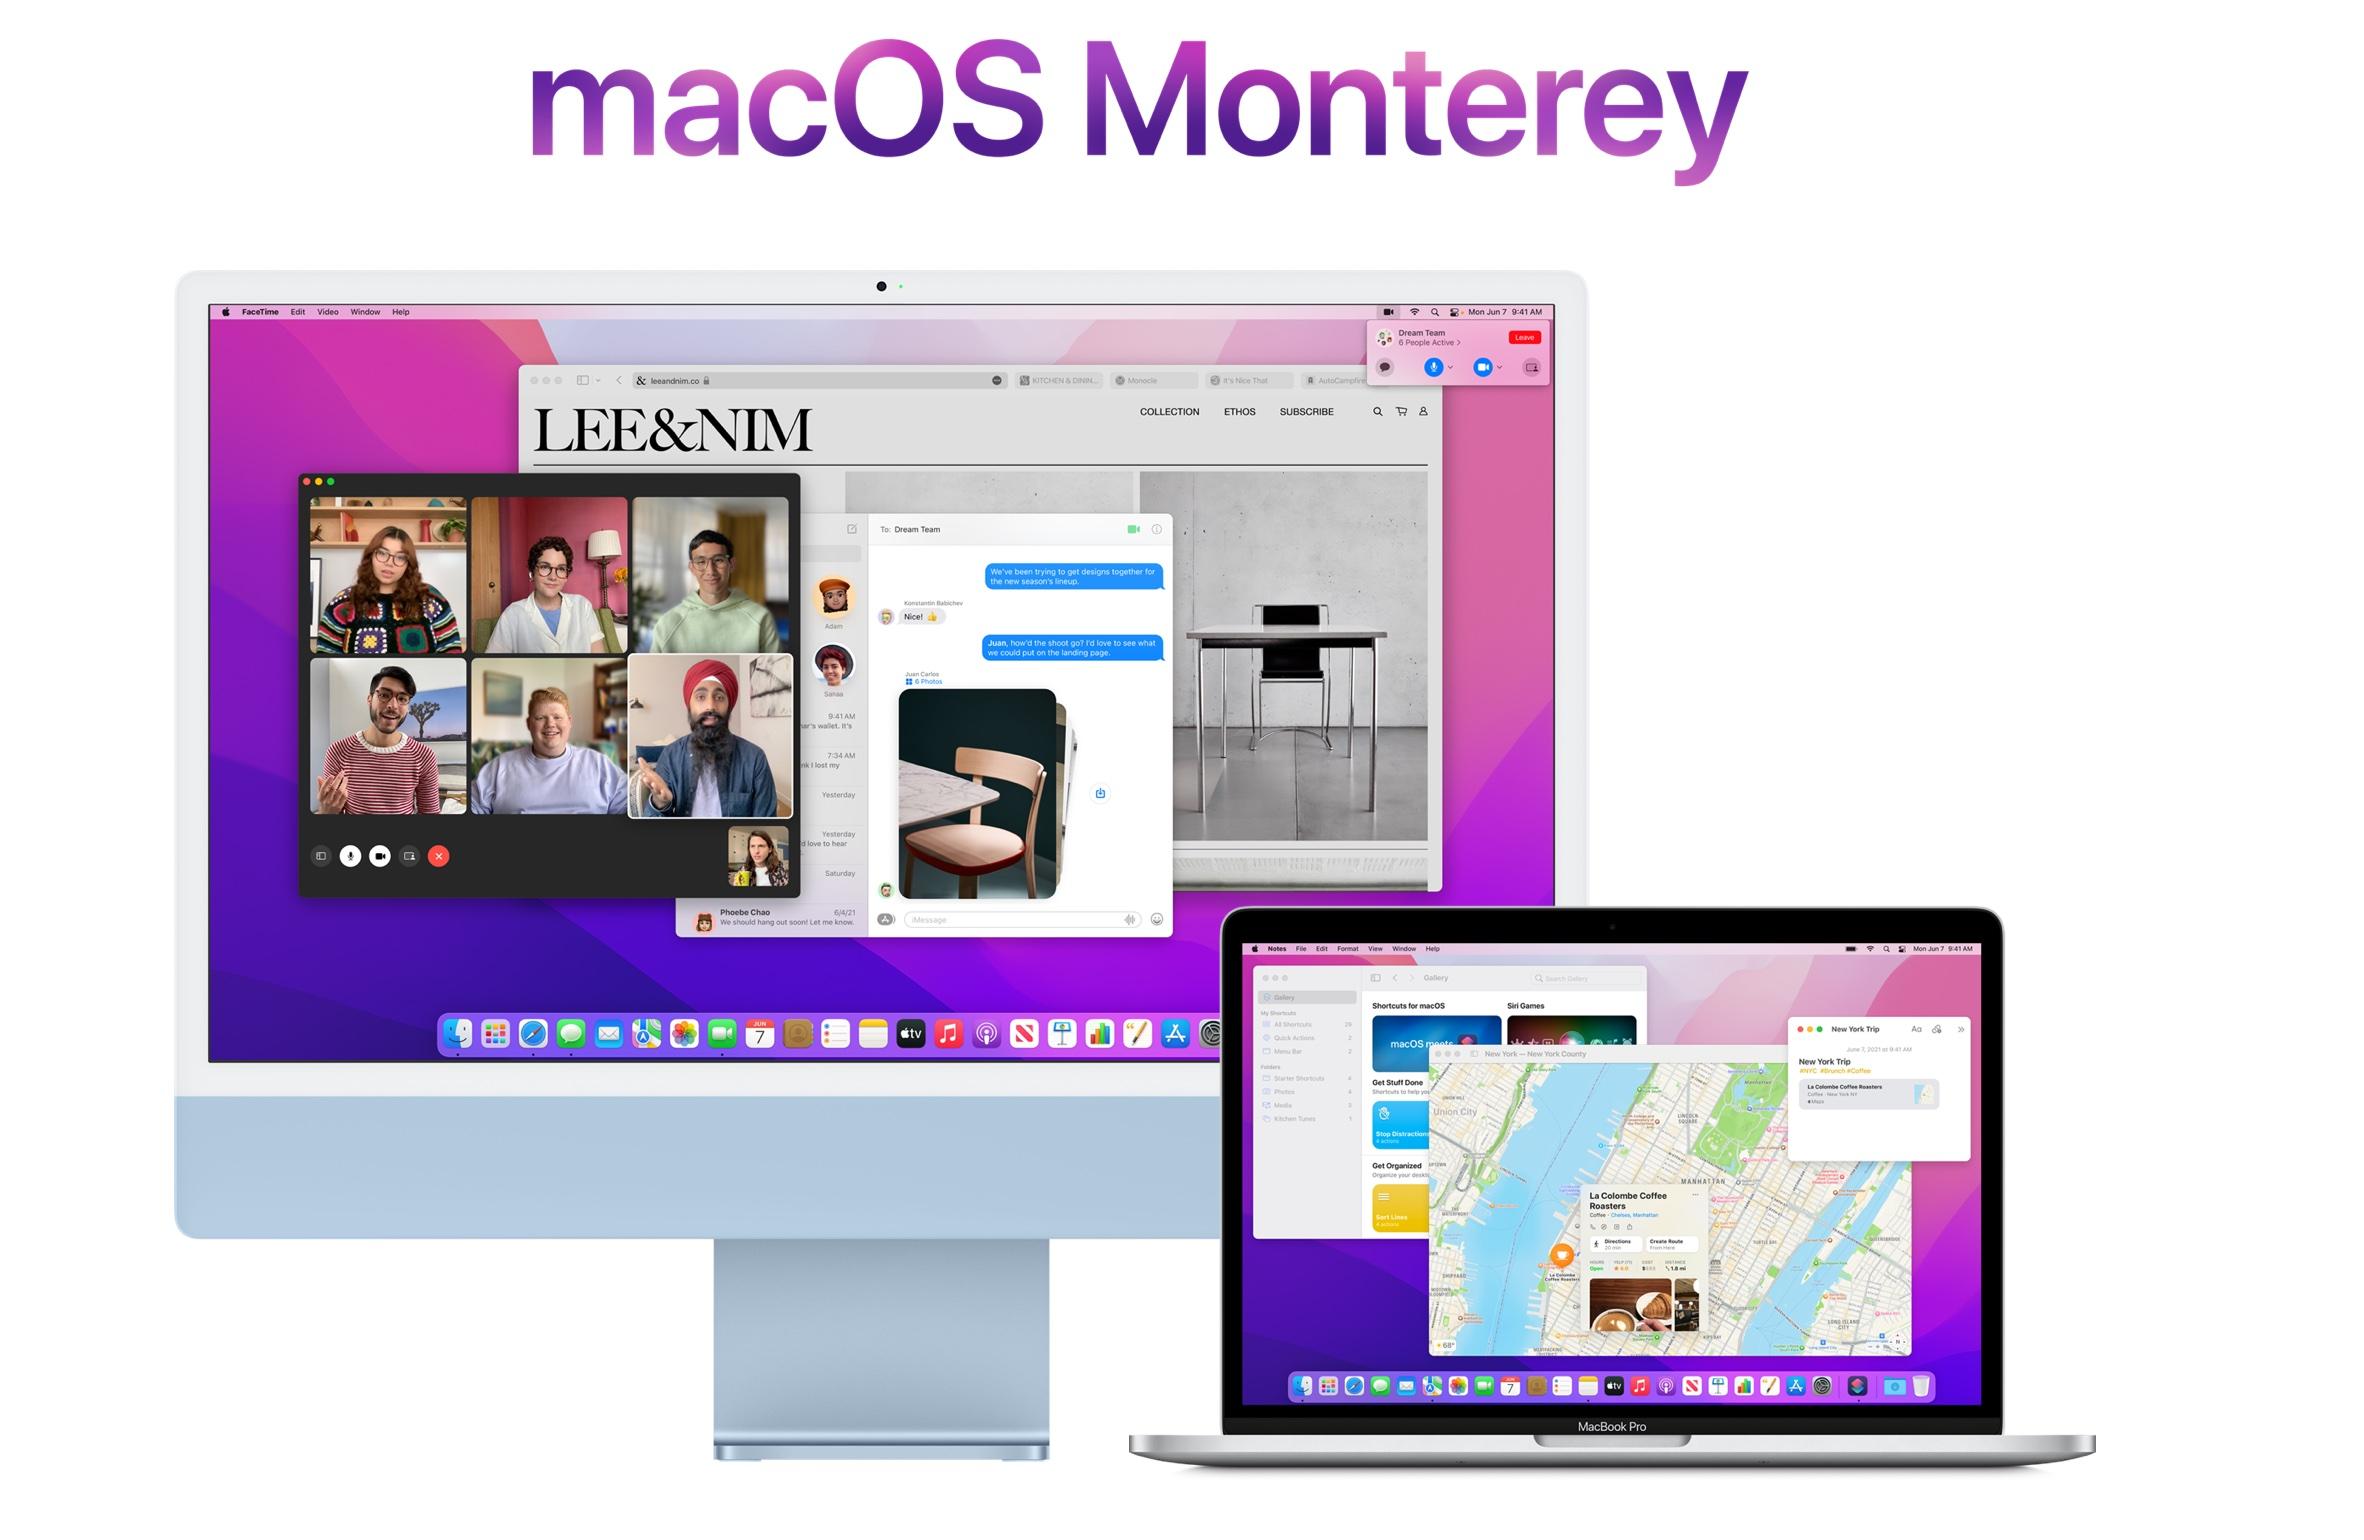 Apple WWDC: Better video conferencing, multitasking, privacy and stronger platform integration